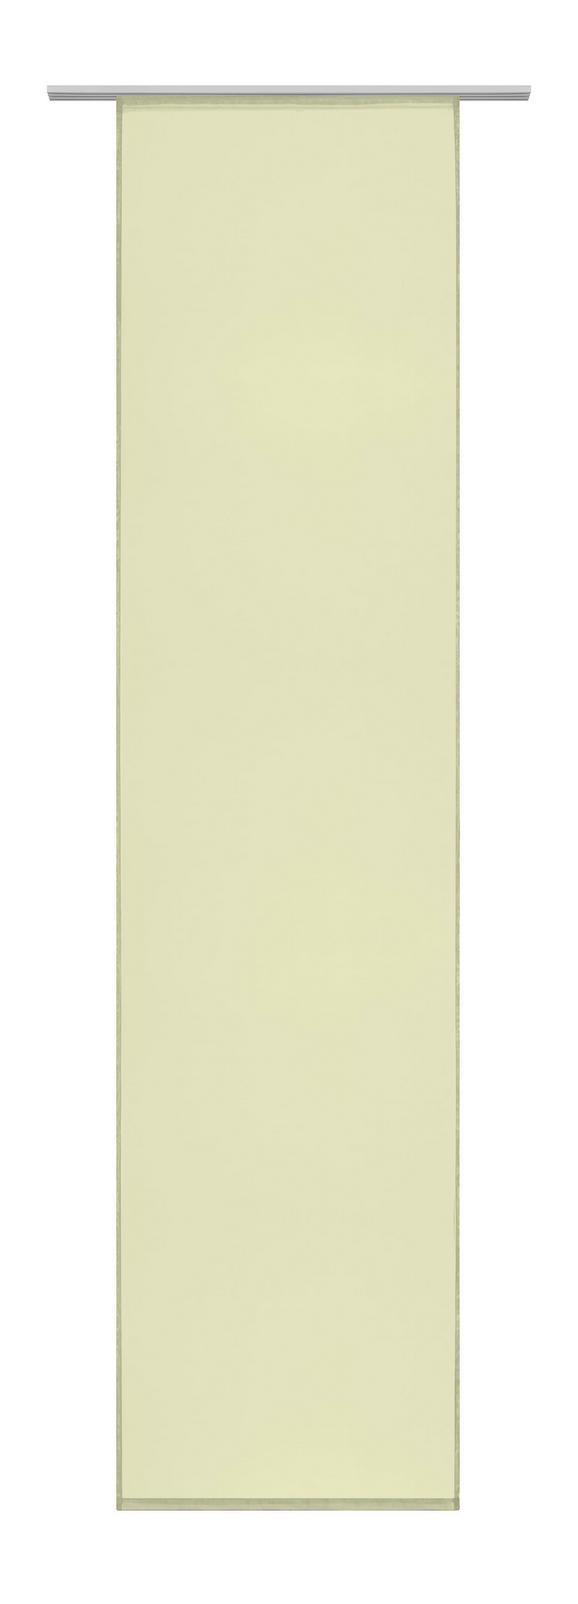 Draperie Panou Flipp Vual -based- -top- - Verde, Material textil (60/245cm) - Based